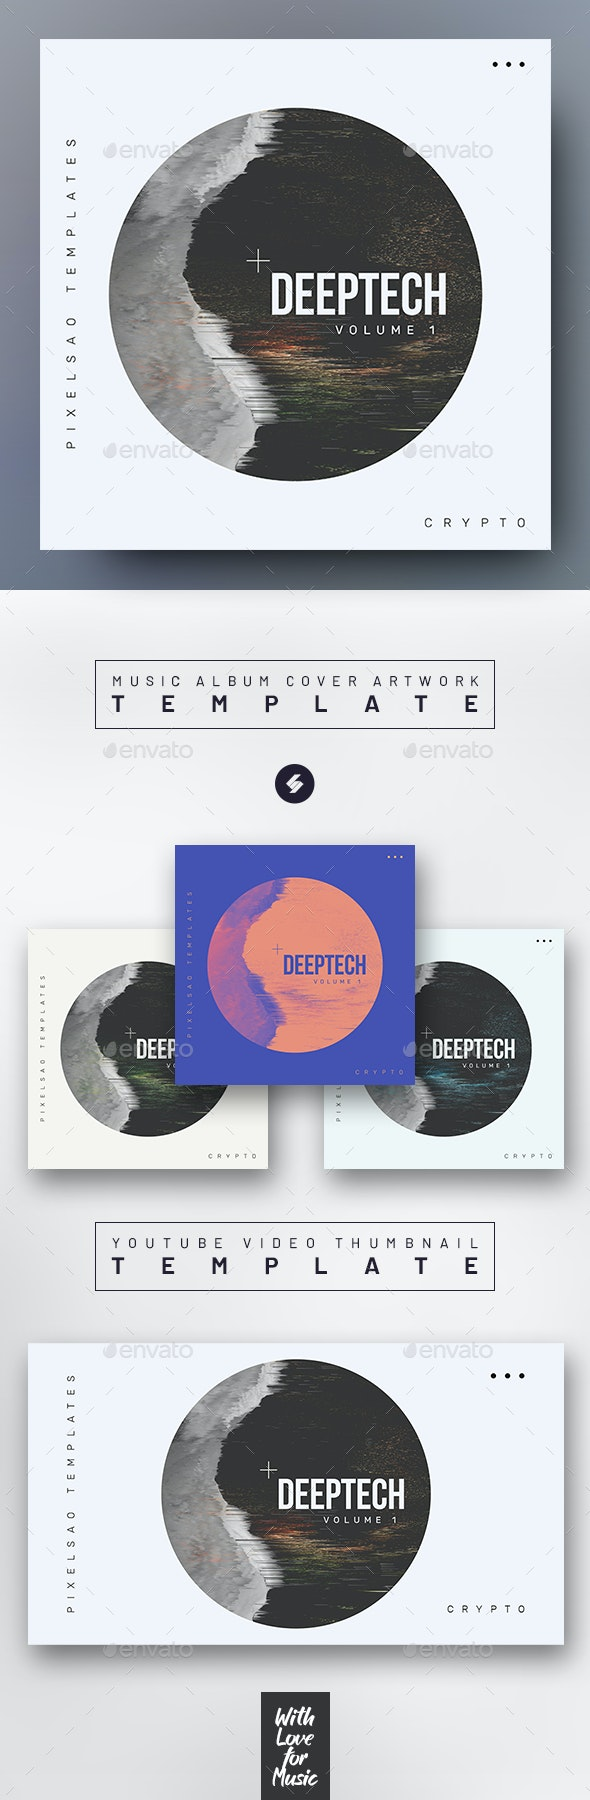 Deeptech – Music Album Cover Artwork Template - Miscellaneous Social Media